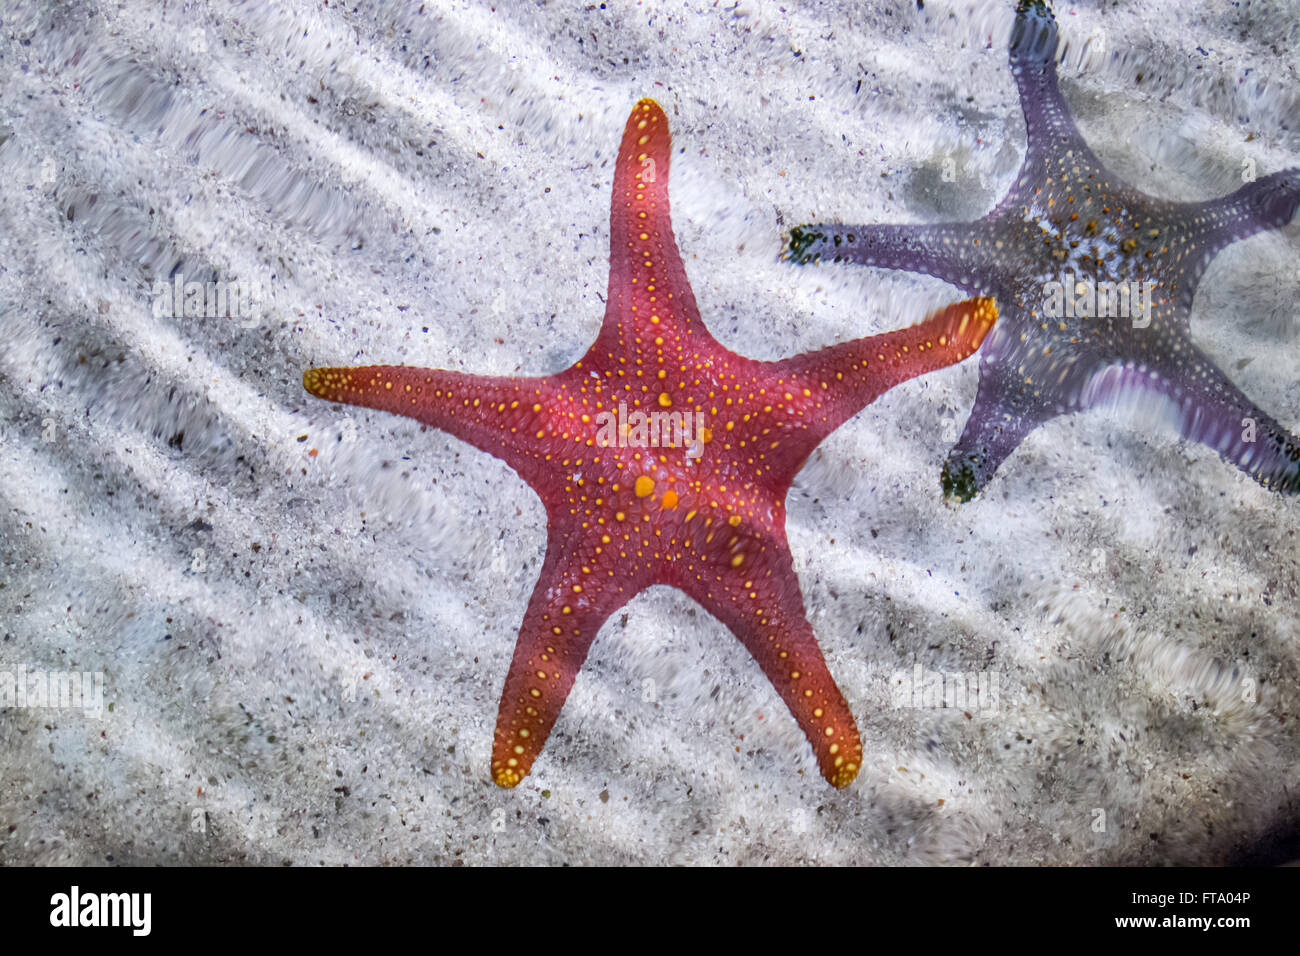 Red Sea Star Australia Stock Photos & Red Sea Star Australia Stock ...